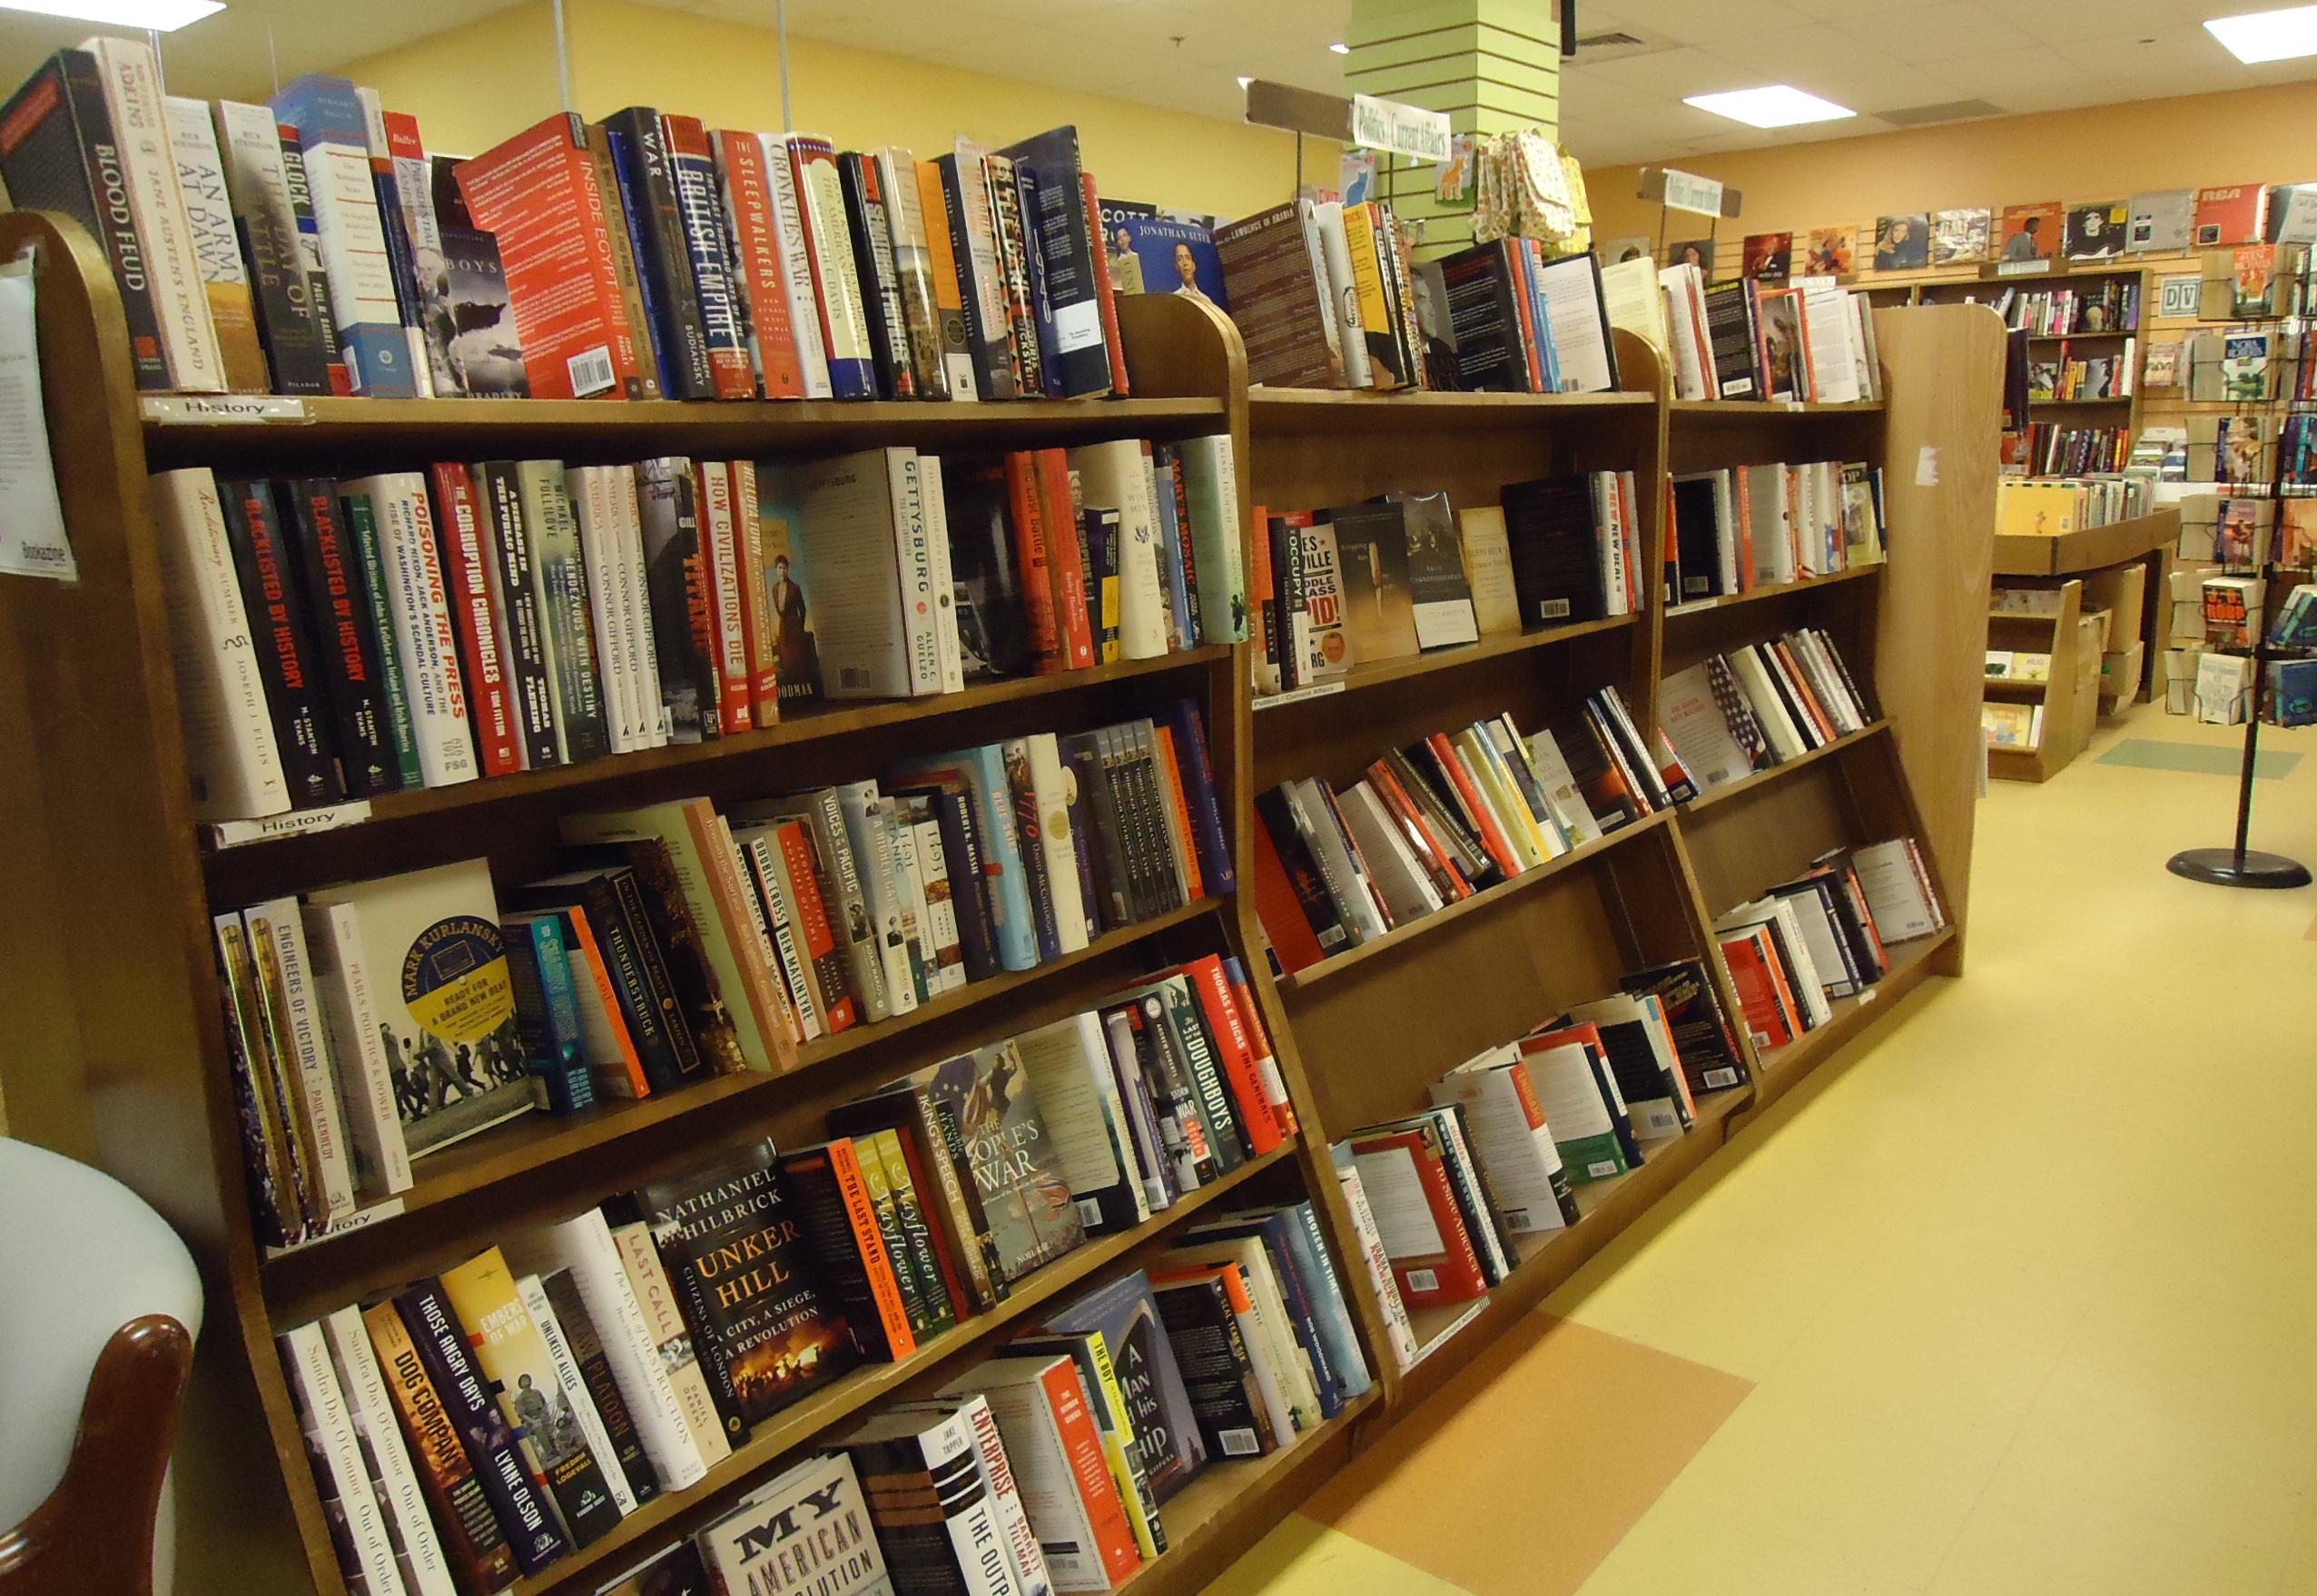 stockvault-bookstore-shelves147377